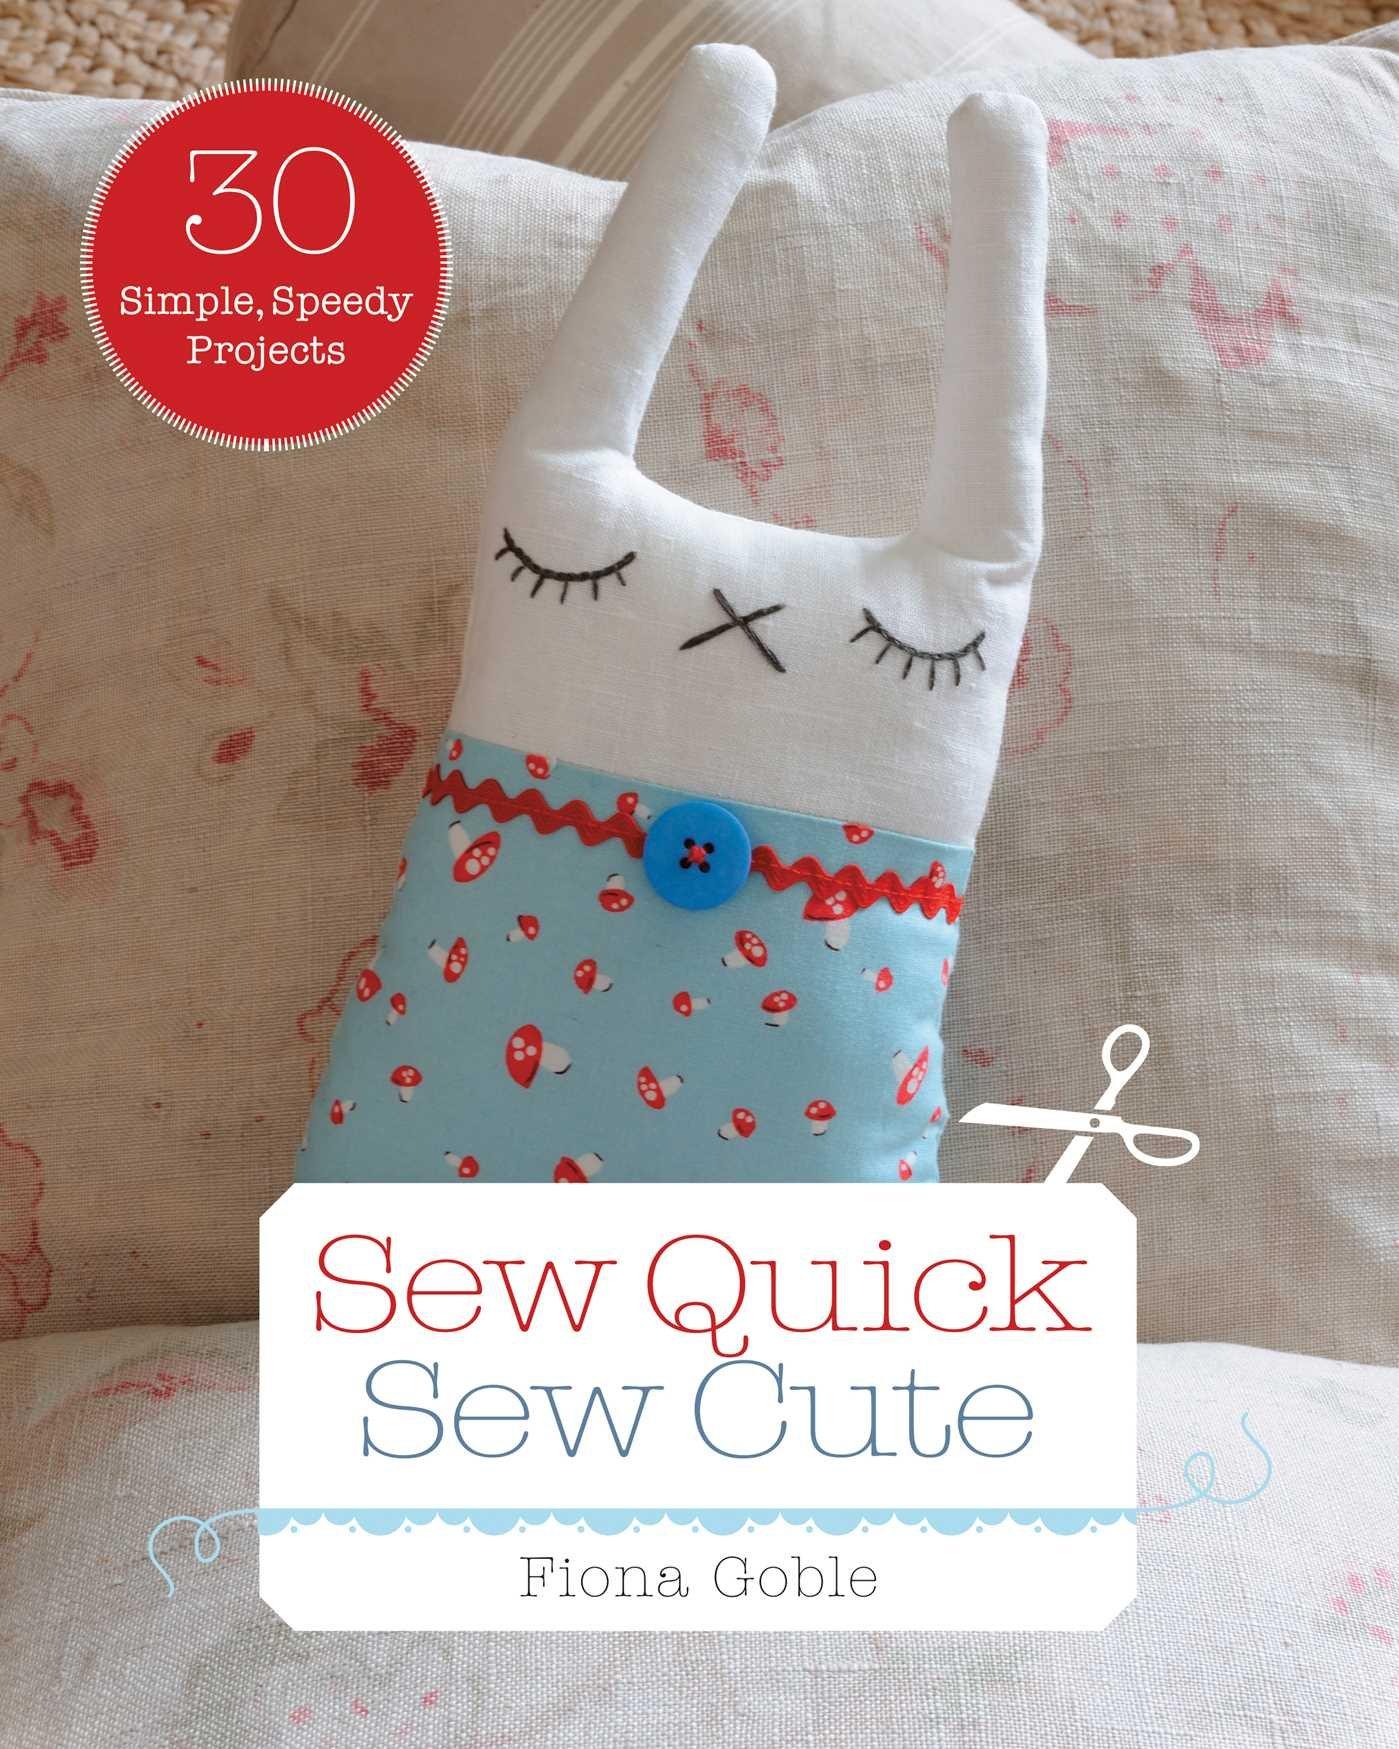 Sew Quick, Sew Cute: 30 Simple, Speedy Projects: Fiona Goble:  0045079565203: Amazon.com: Books